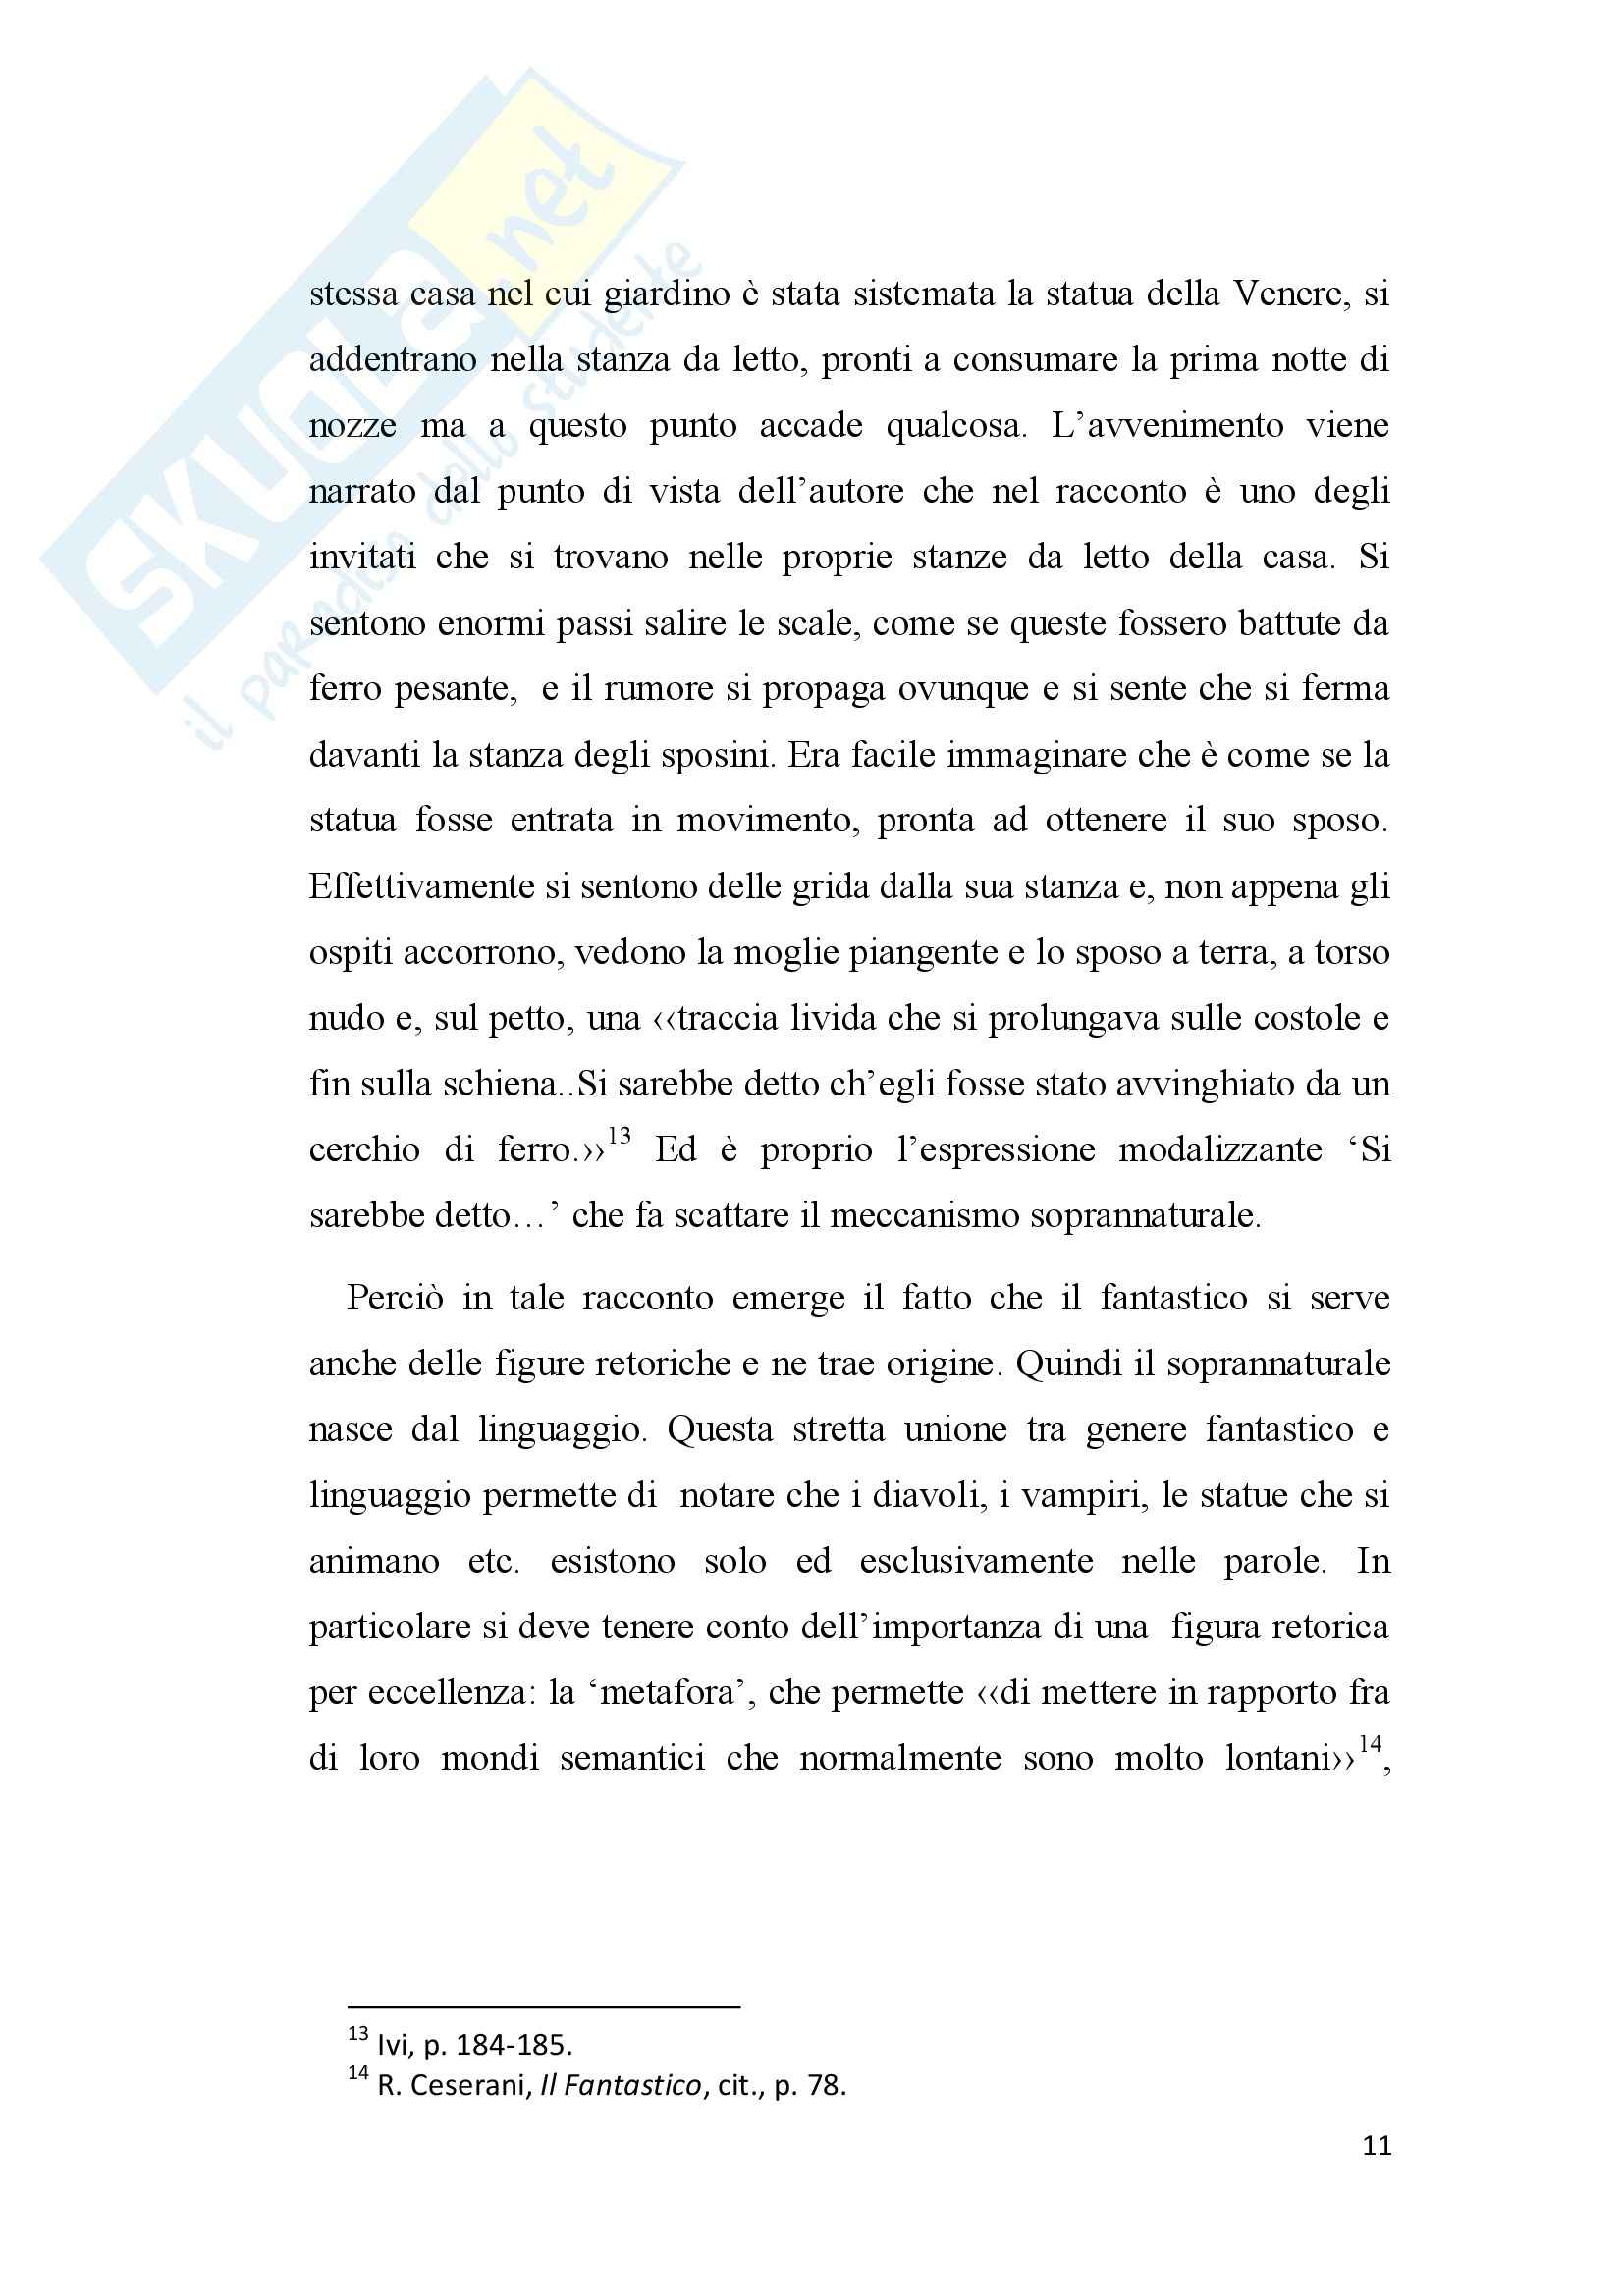 Tesi - Italo Calvino e il fantastico Pag. 11